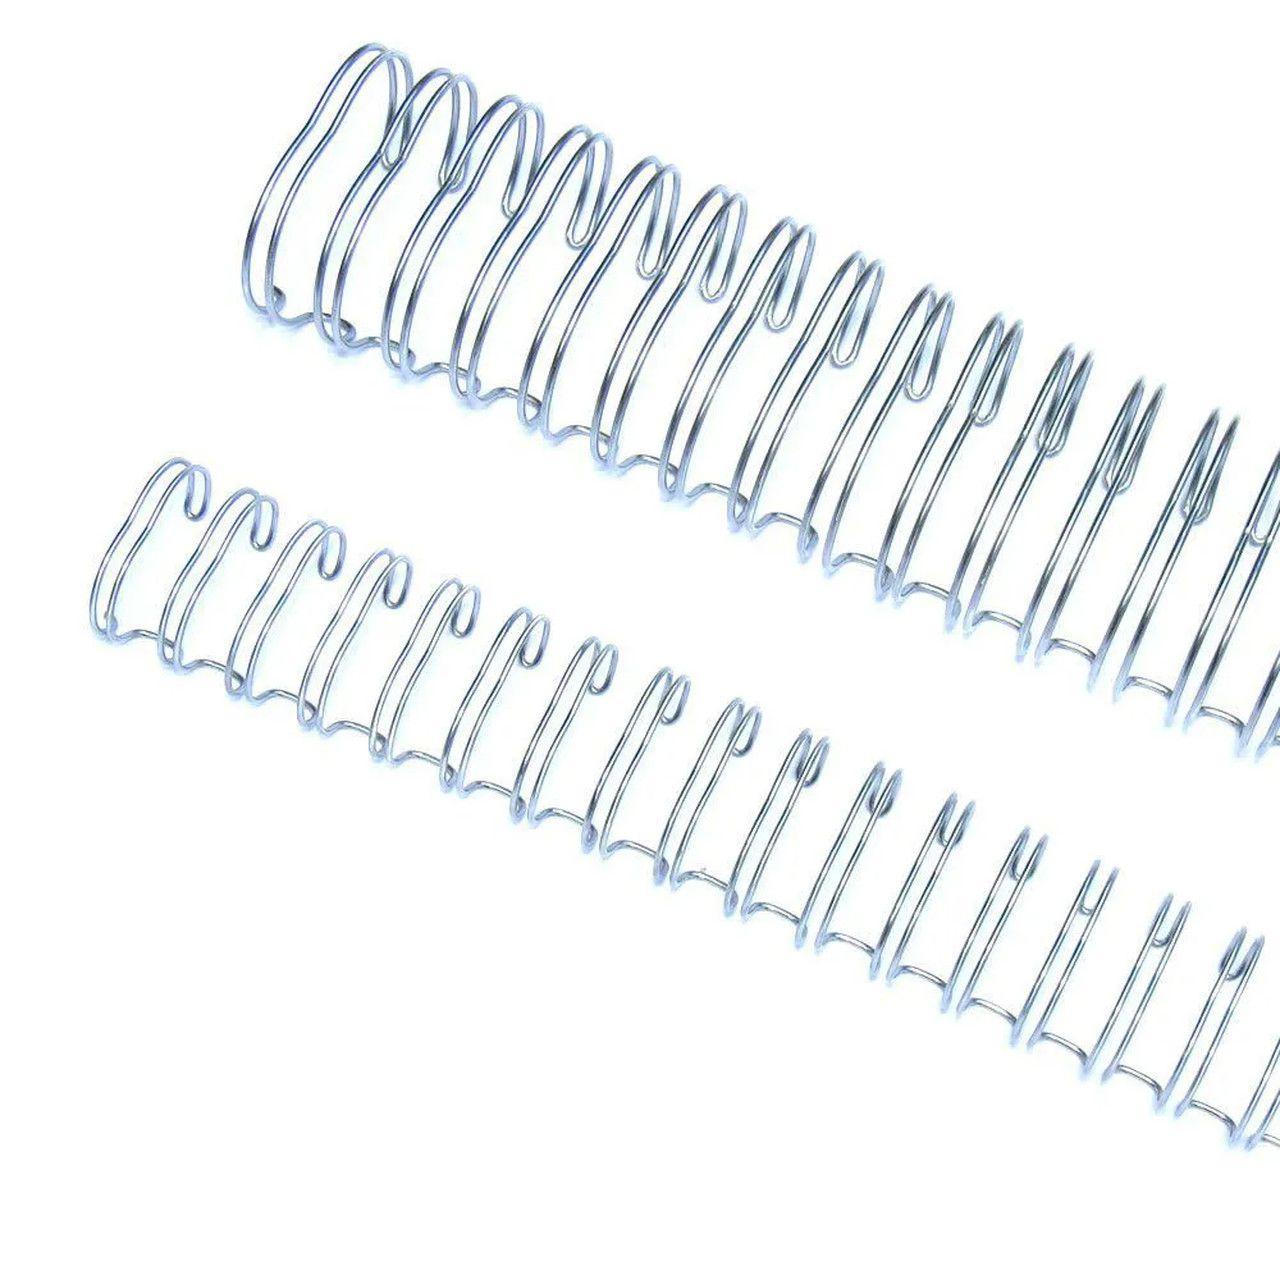 "Wire-o 1""1/4 para 270 fls Ofício 2x1 Prata(Silver) 25 und"